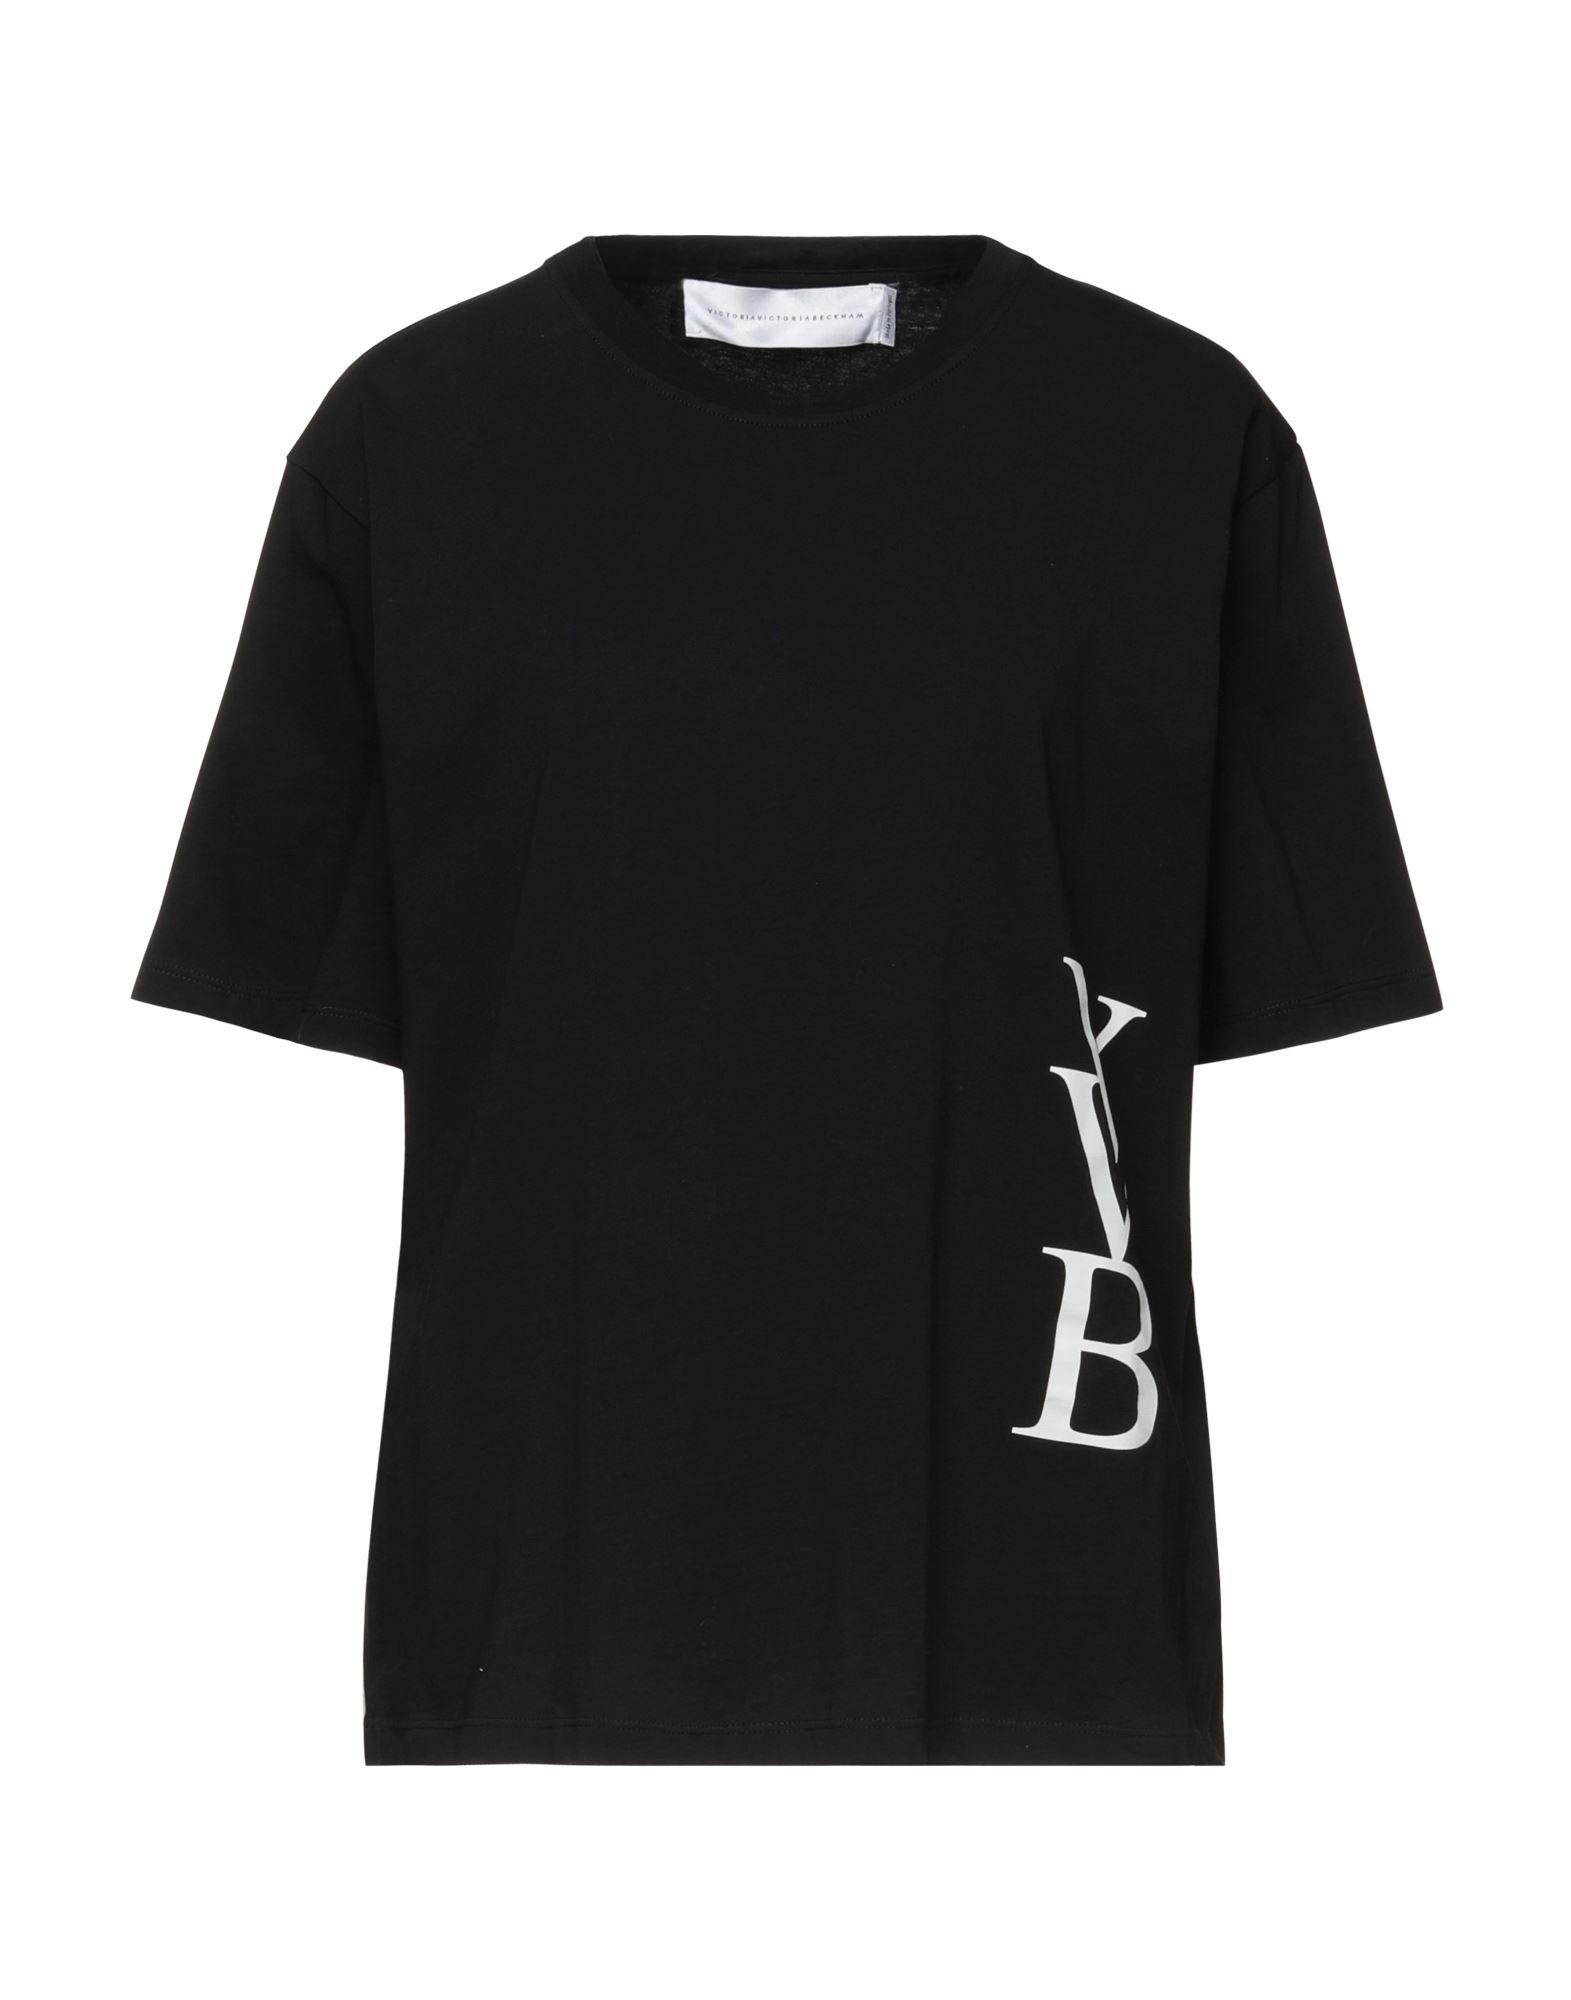 VICTORIA, VICTORIA BECKHAM T-shirts - Item 12564889